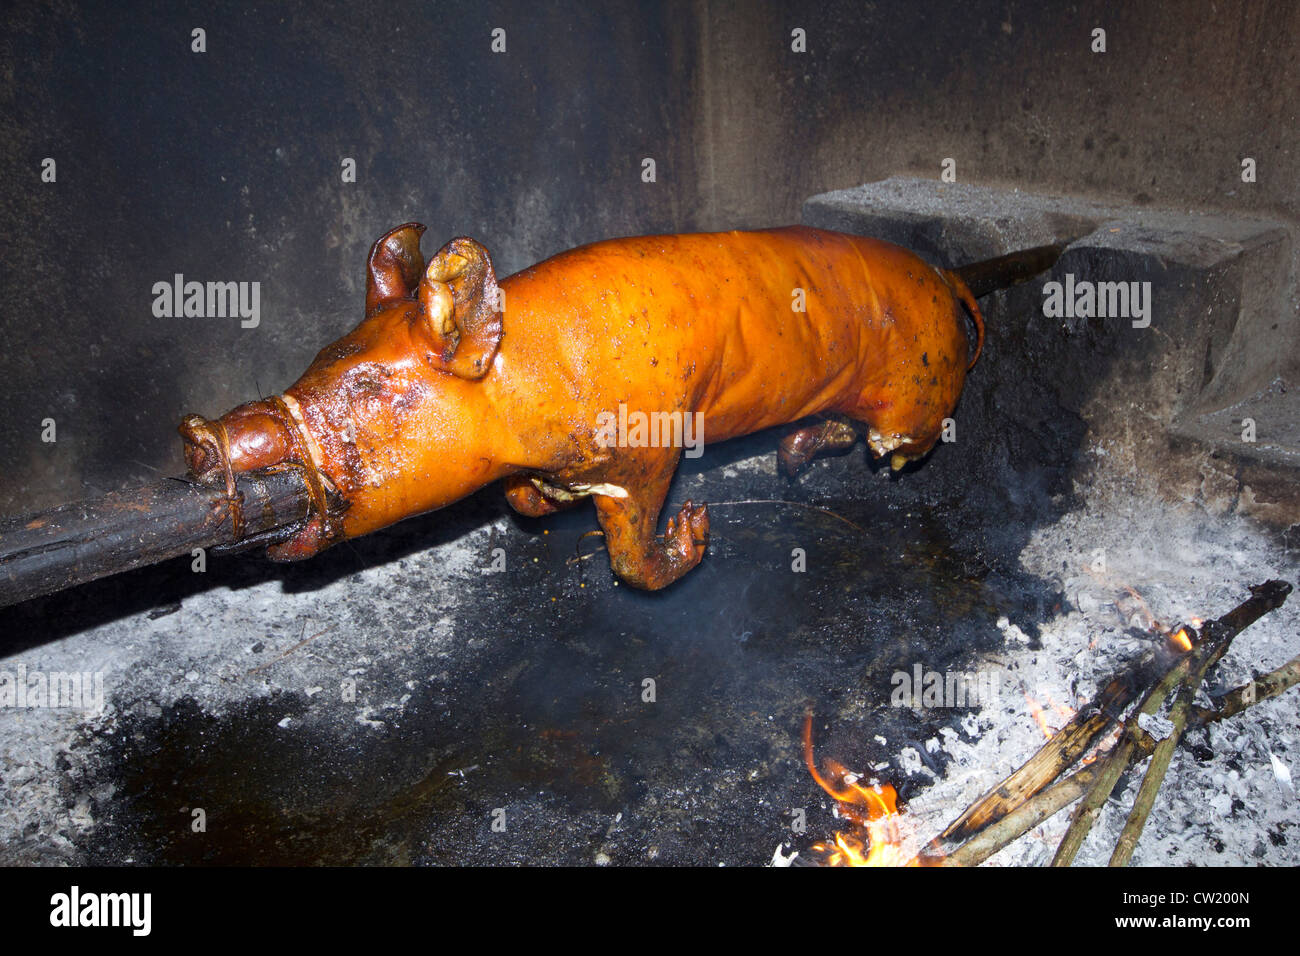 55 Gambar Babi Guling Kekinian